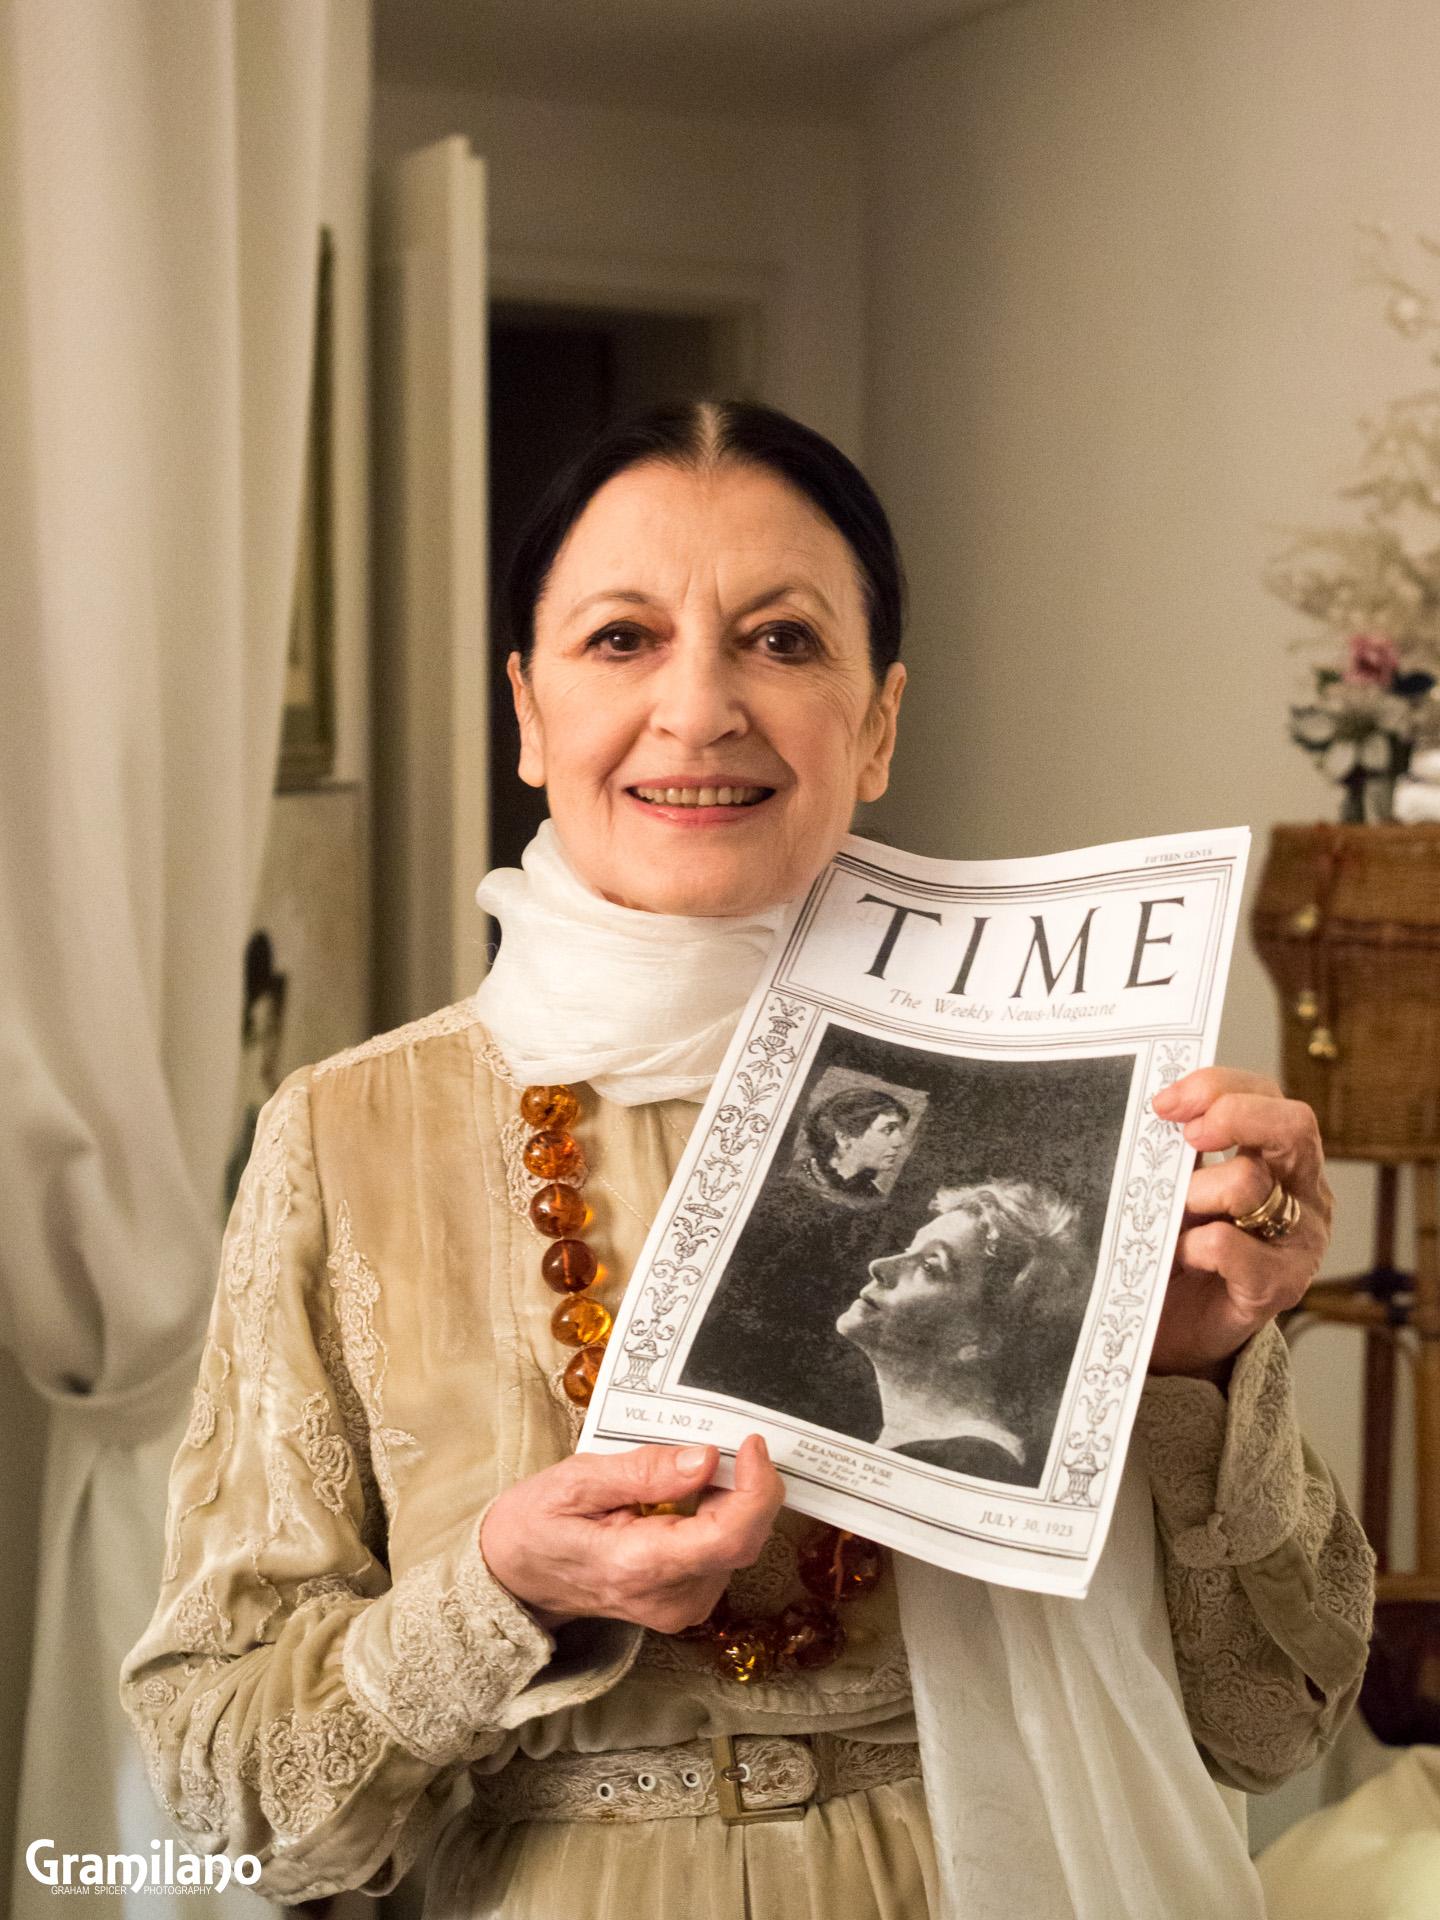 Carla Fracci (La Scala Ballet - American Ballet Theatre)